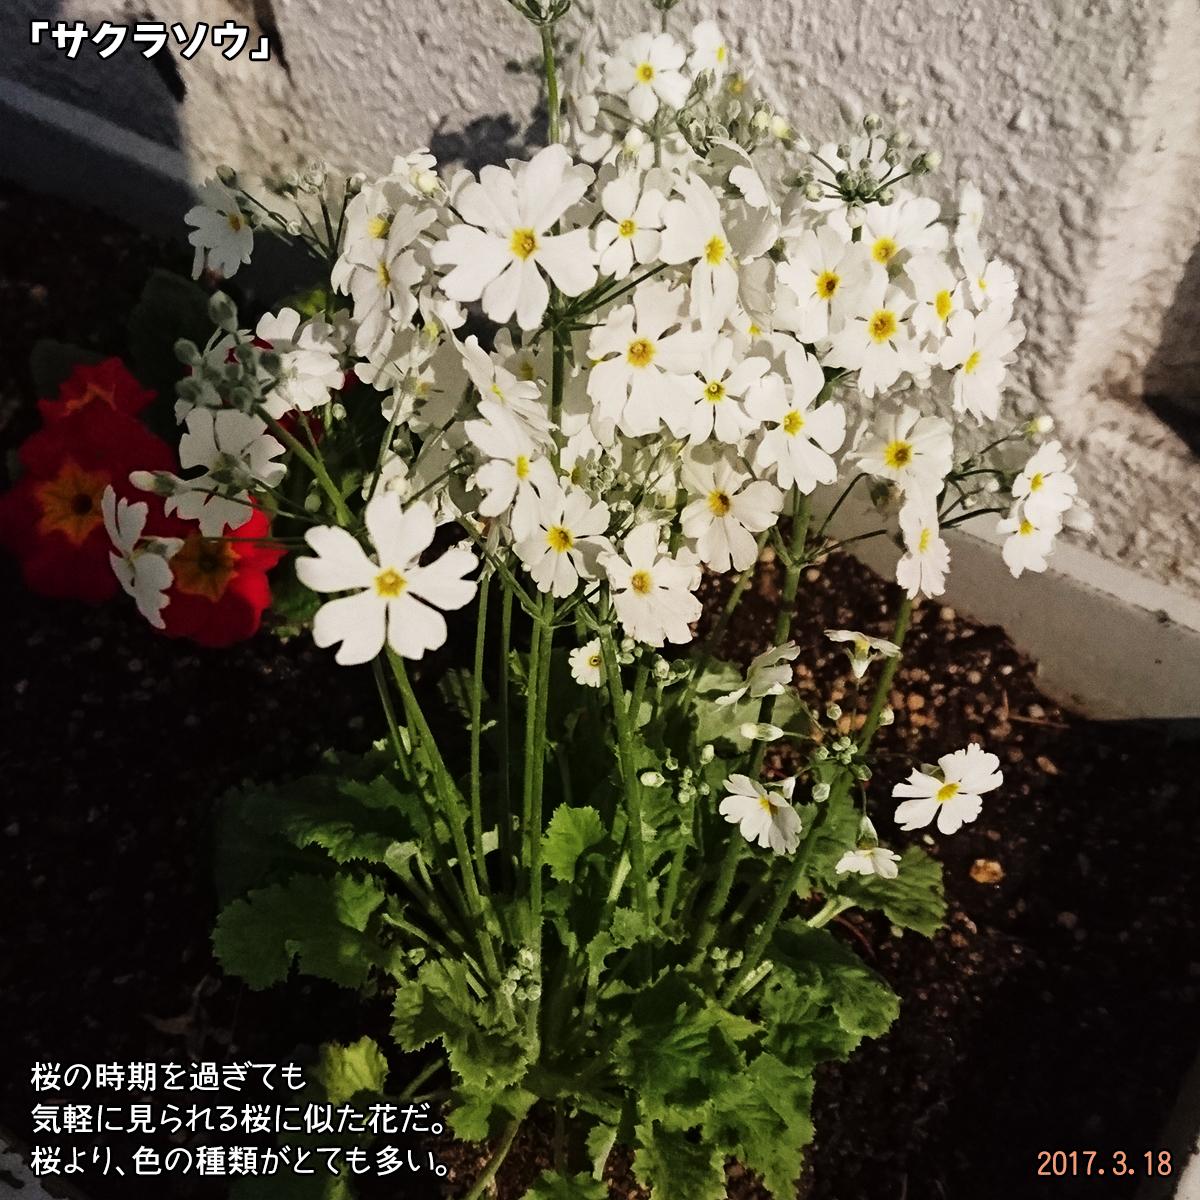 DSC_1957_1.jpg